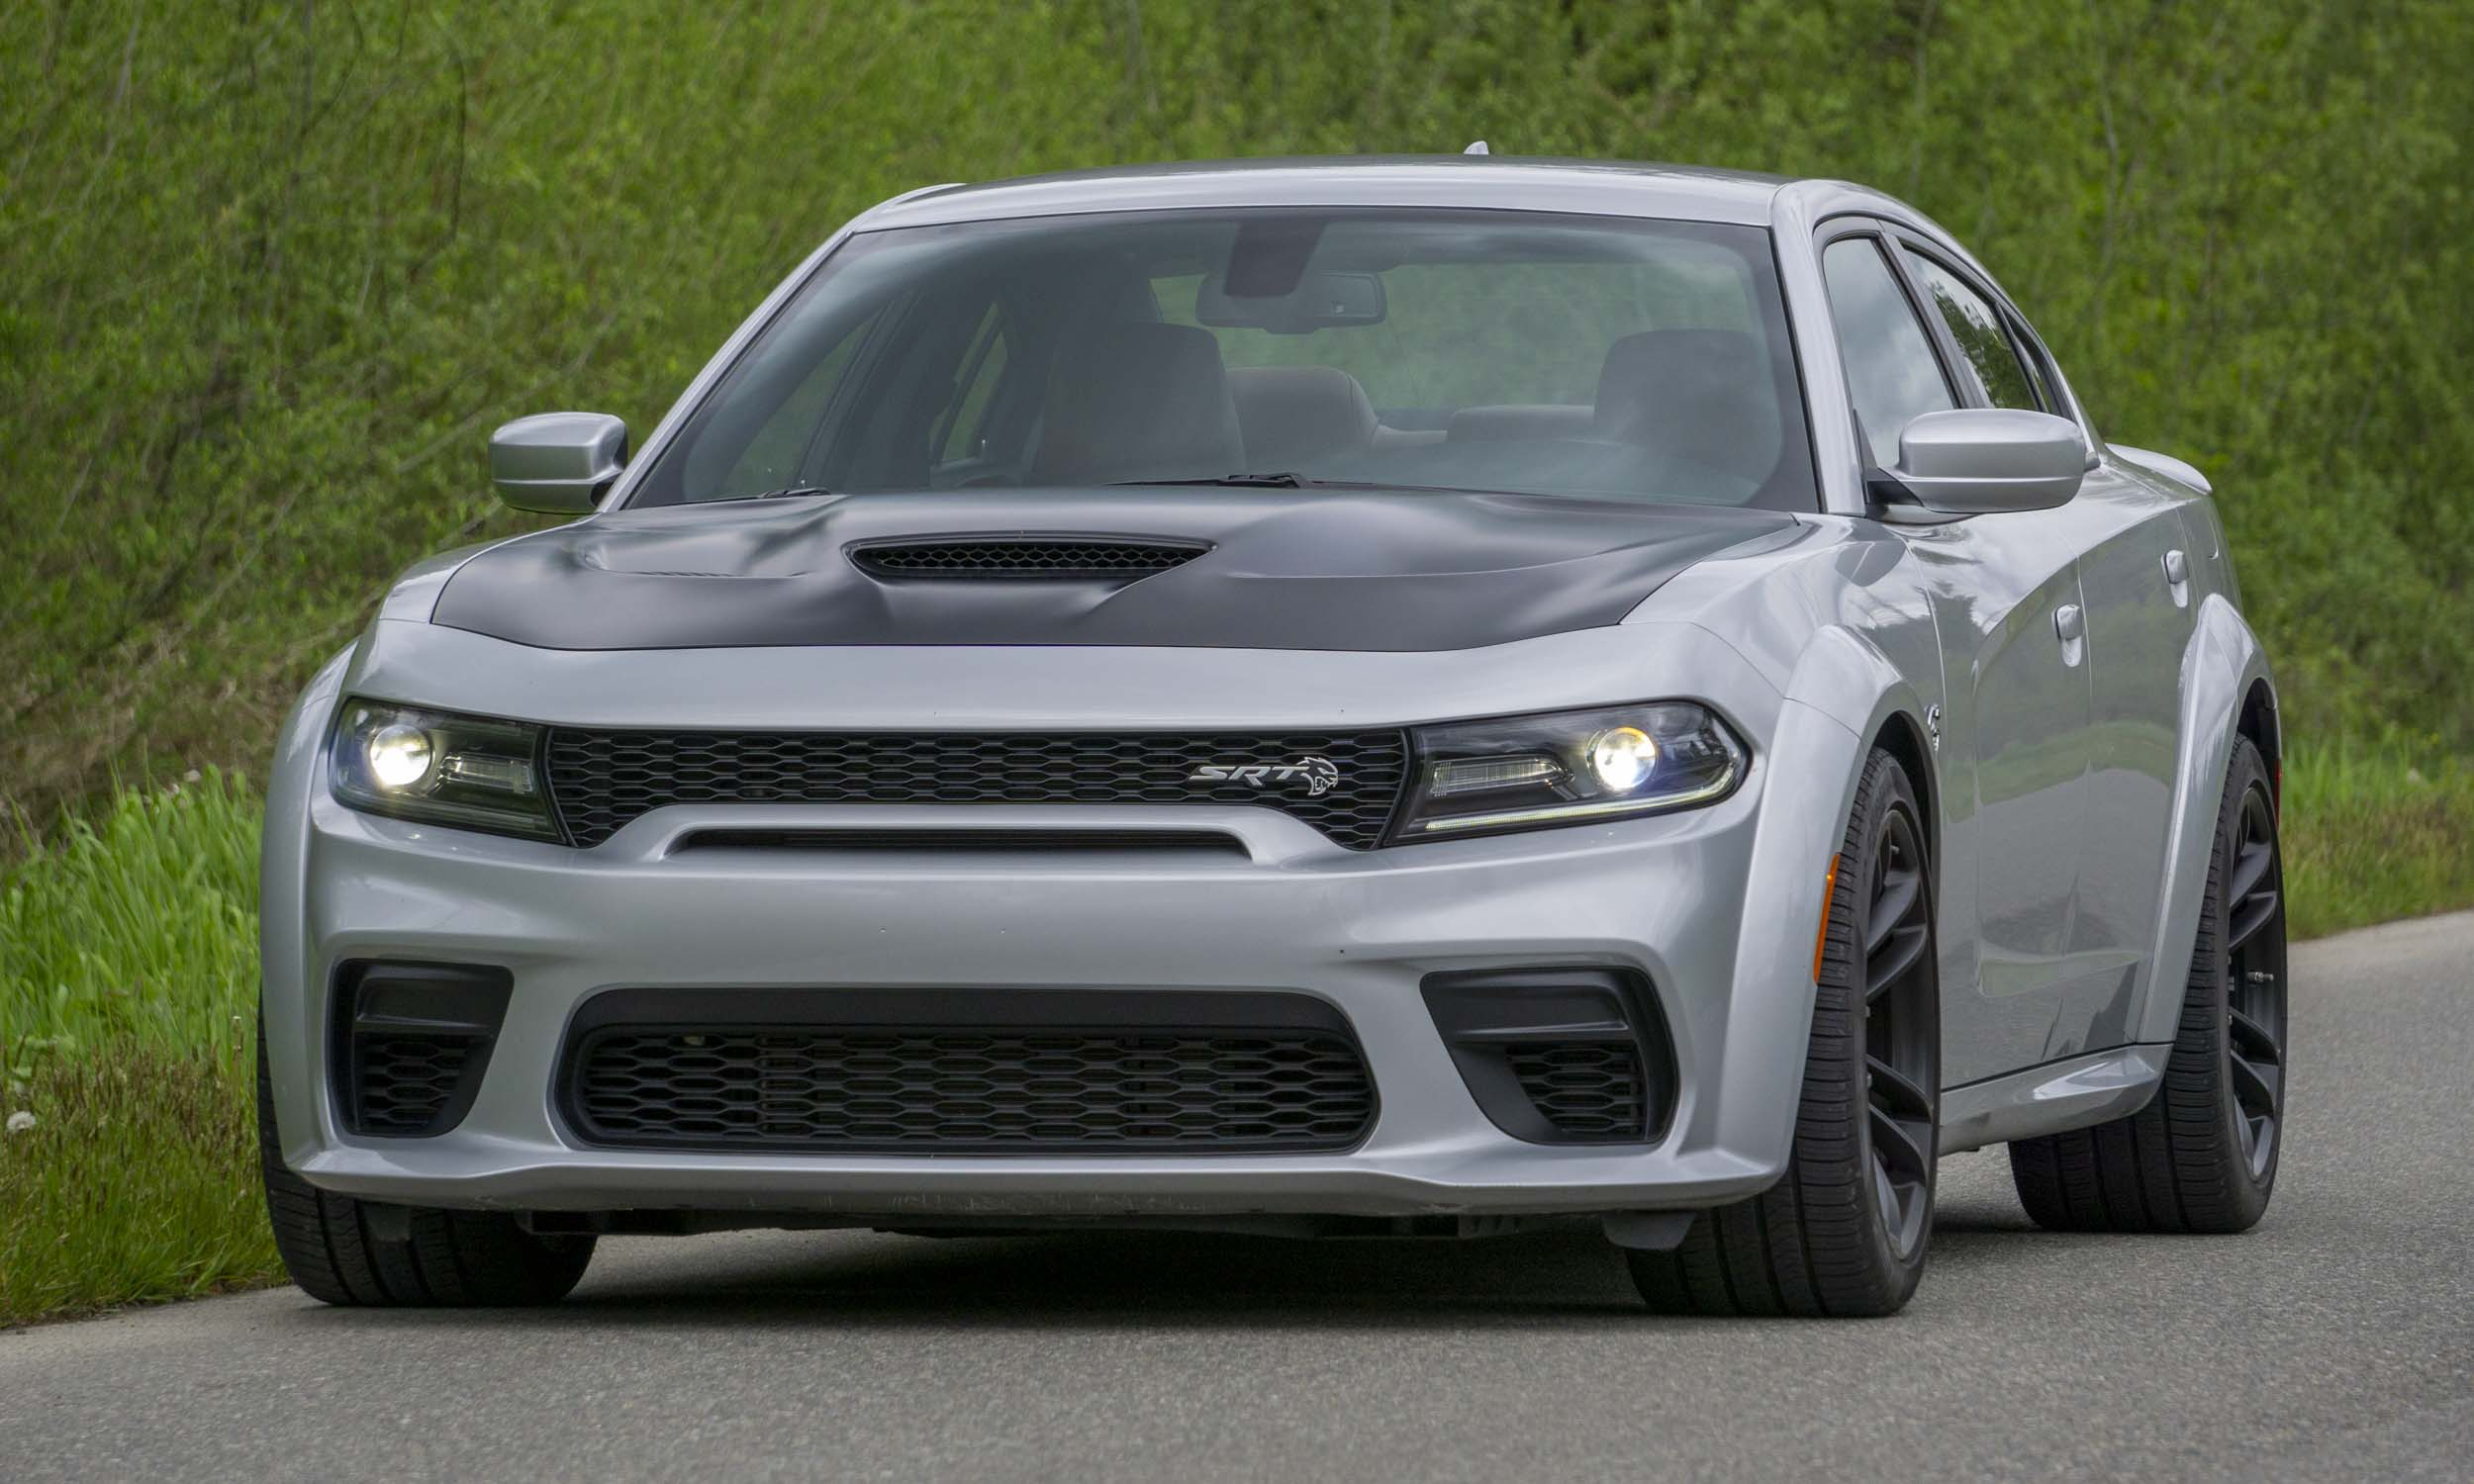 2020 Dodge Charger Srt Hellcat Widebody Review Autonxt